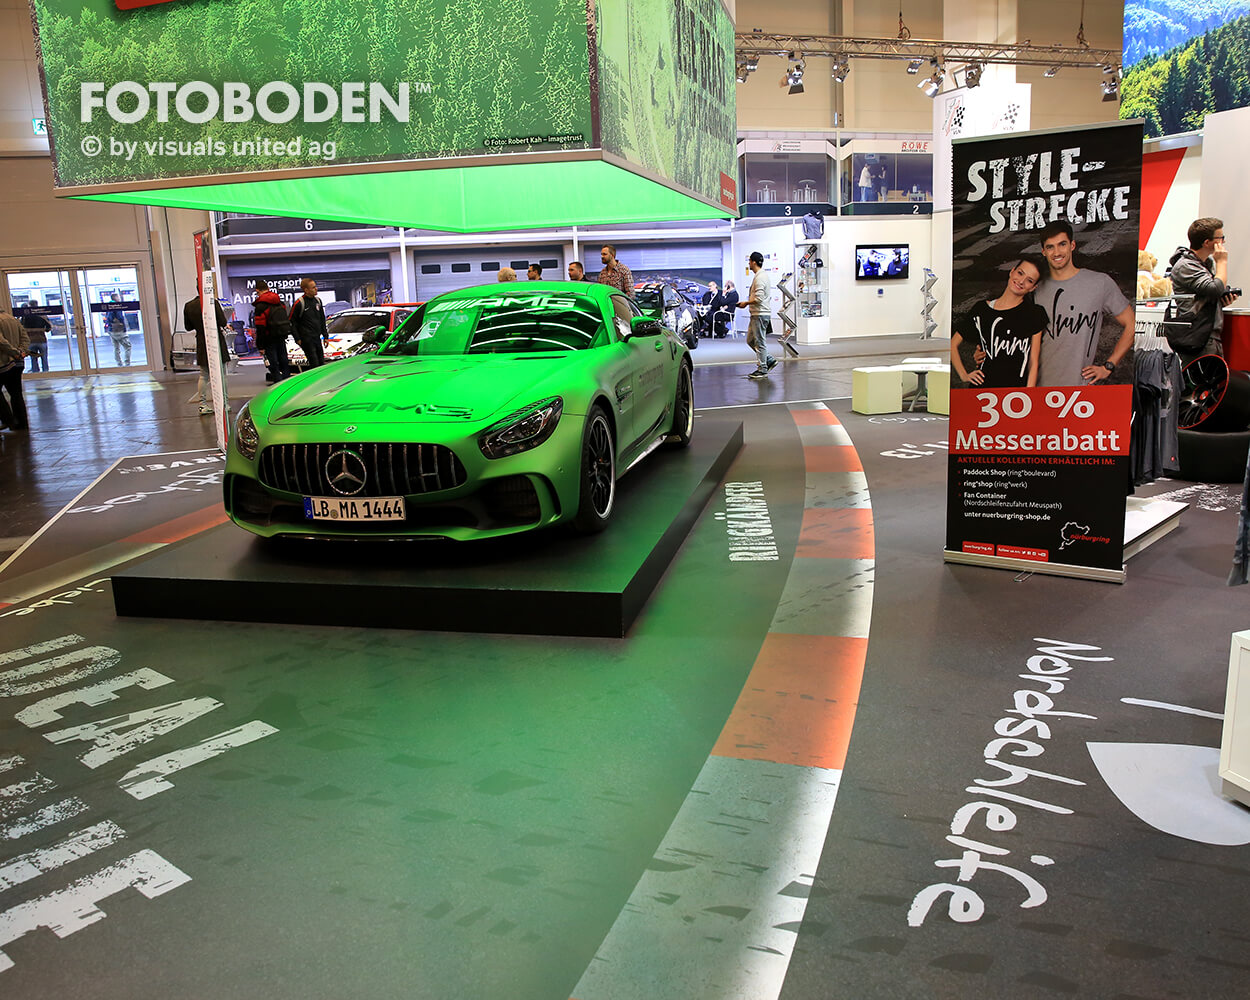 Motorshow Essen Fotoboden Messeboden Tradeshow Flooring Bodengestaltung Messe Bodendesign Messedesign Design Boden Messegestaltung4